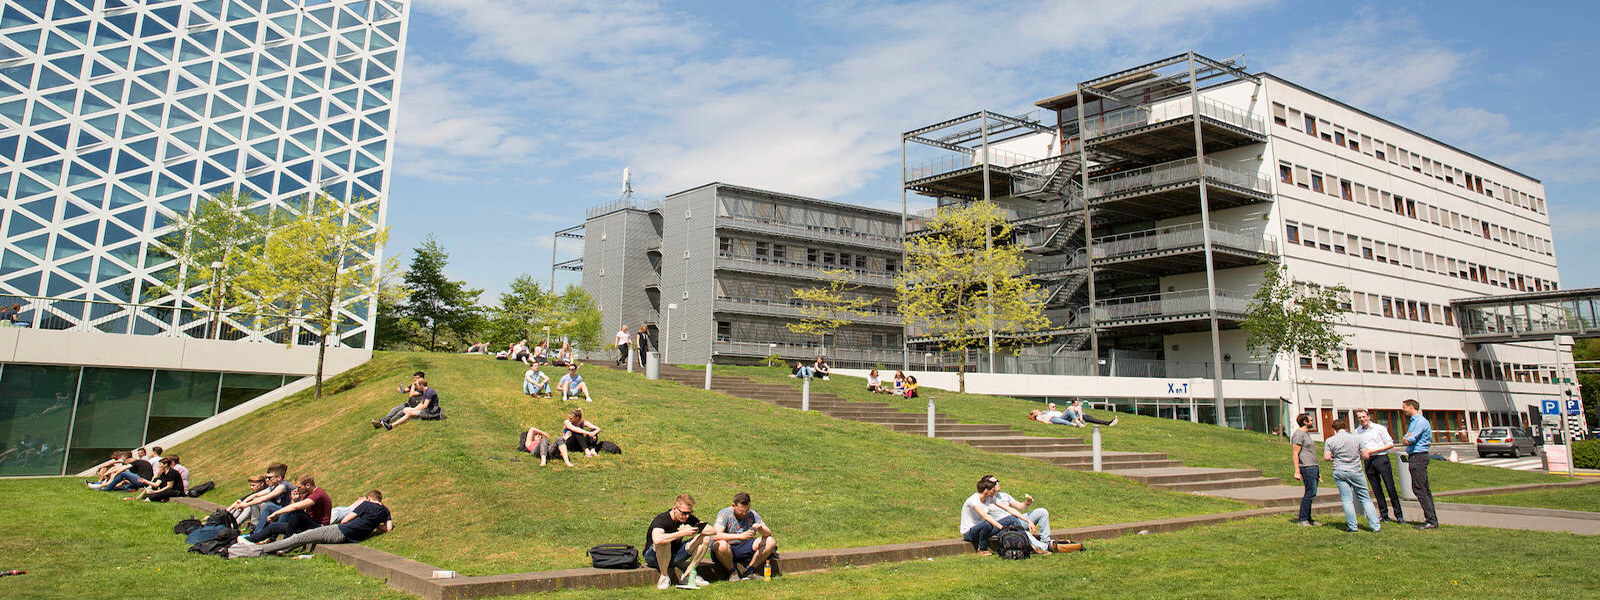 Studyinholland-universitiesofappliedsciences-windesheim-zwolle- holland.